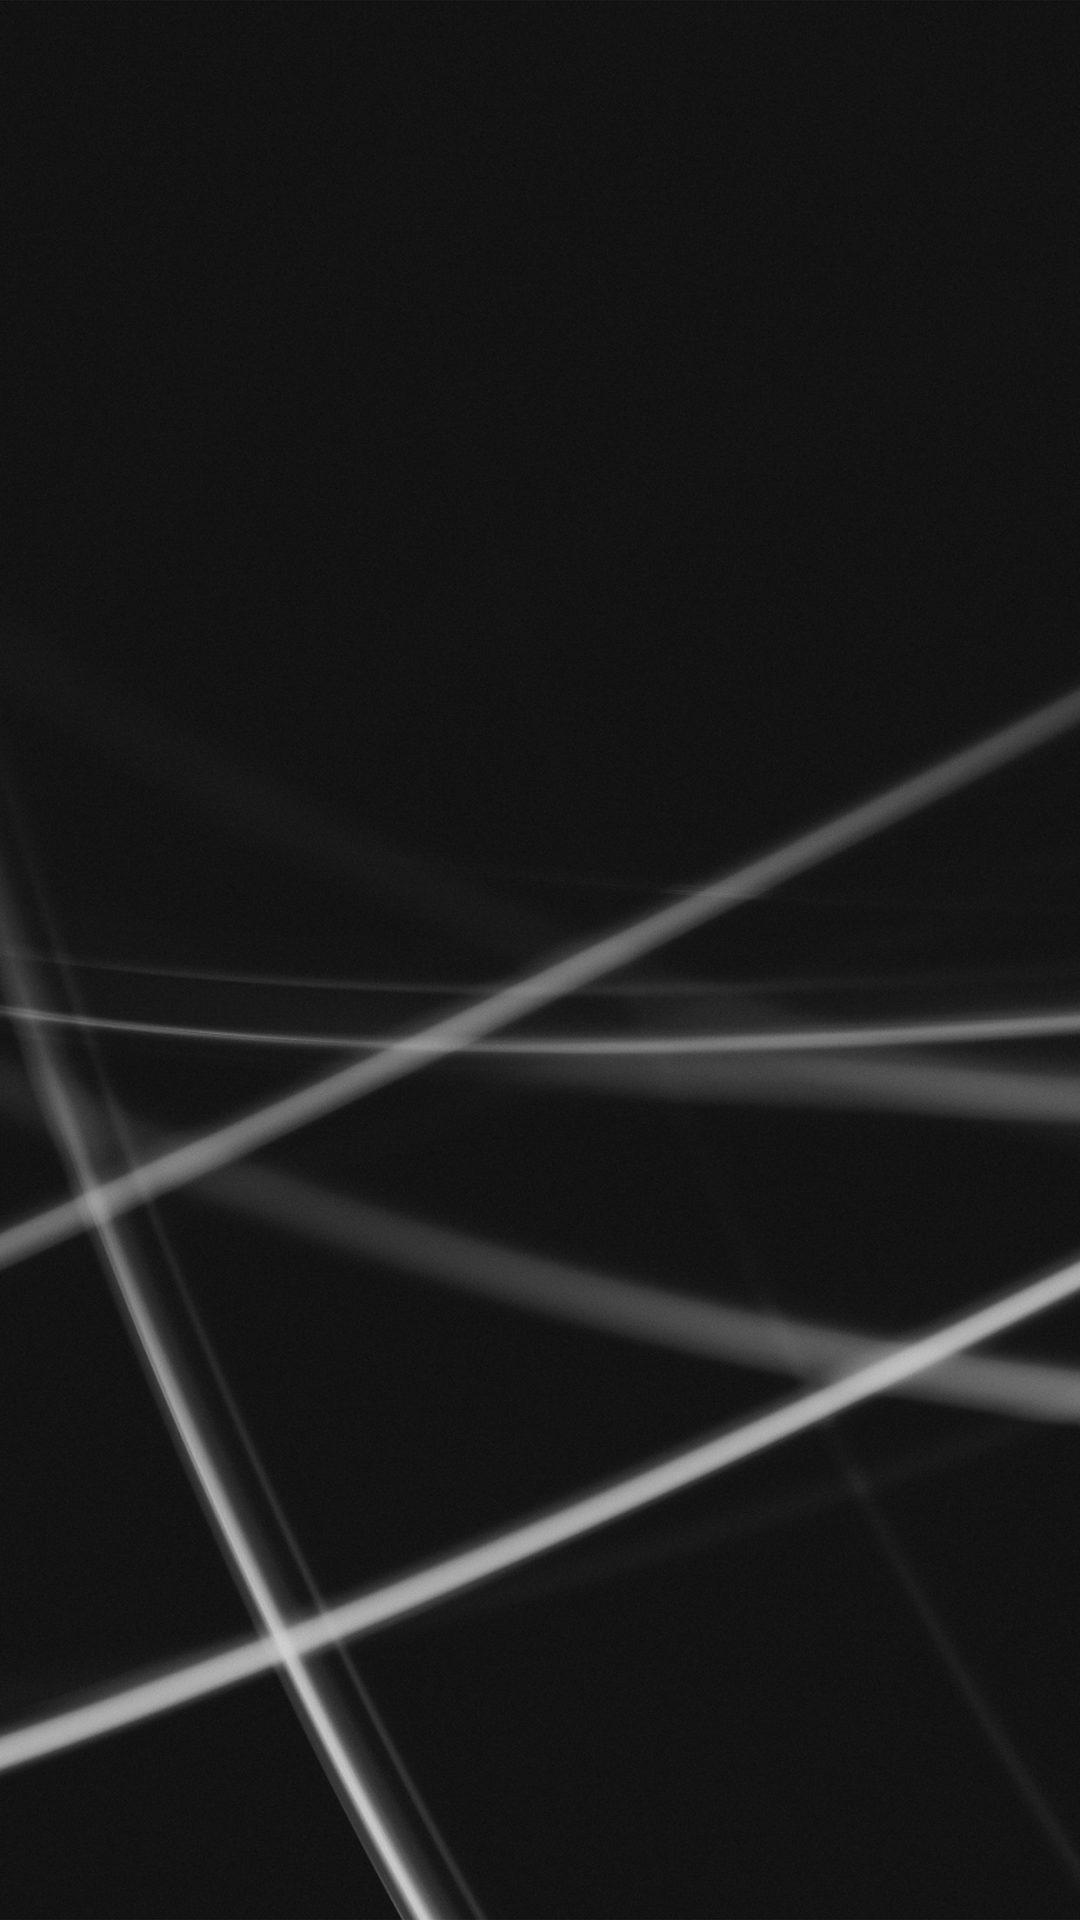 Dark Line Abstract Pattern Bw